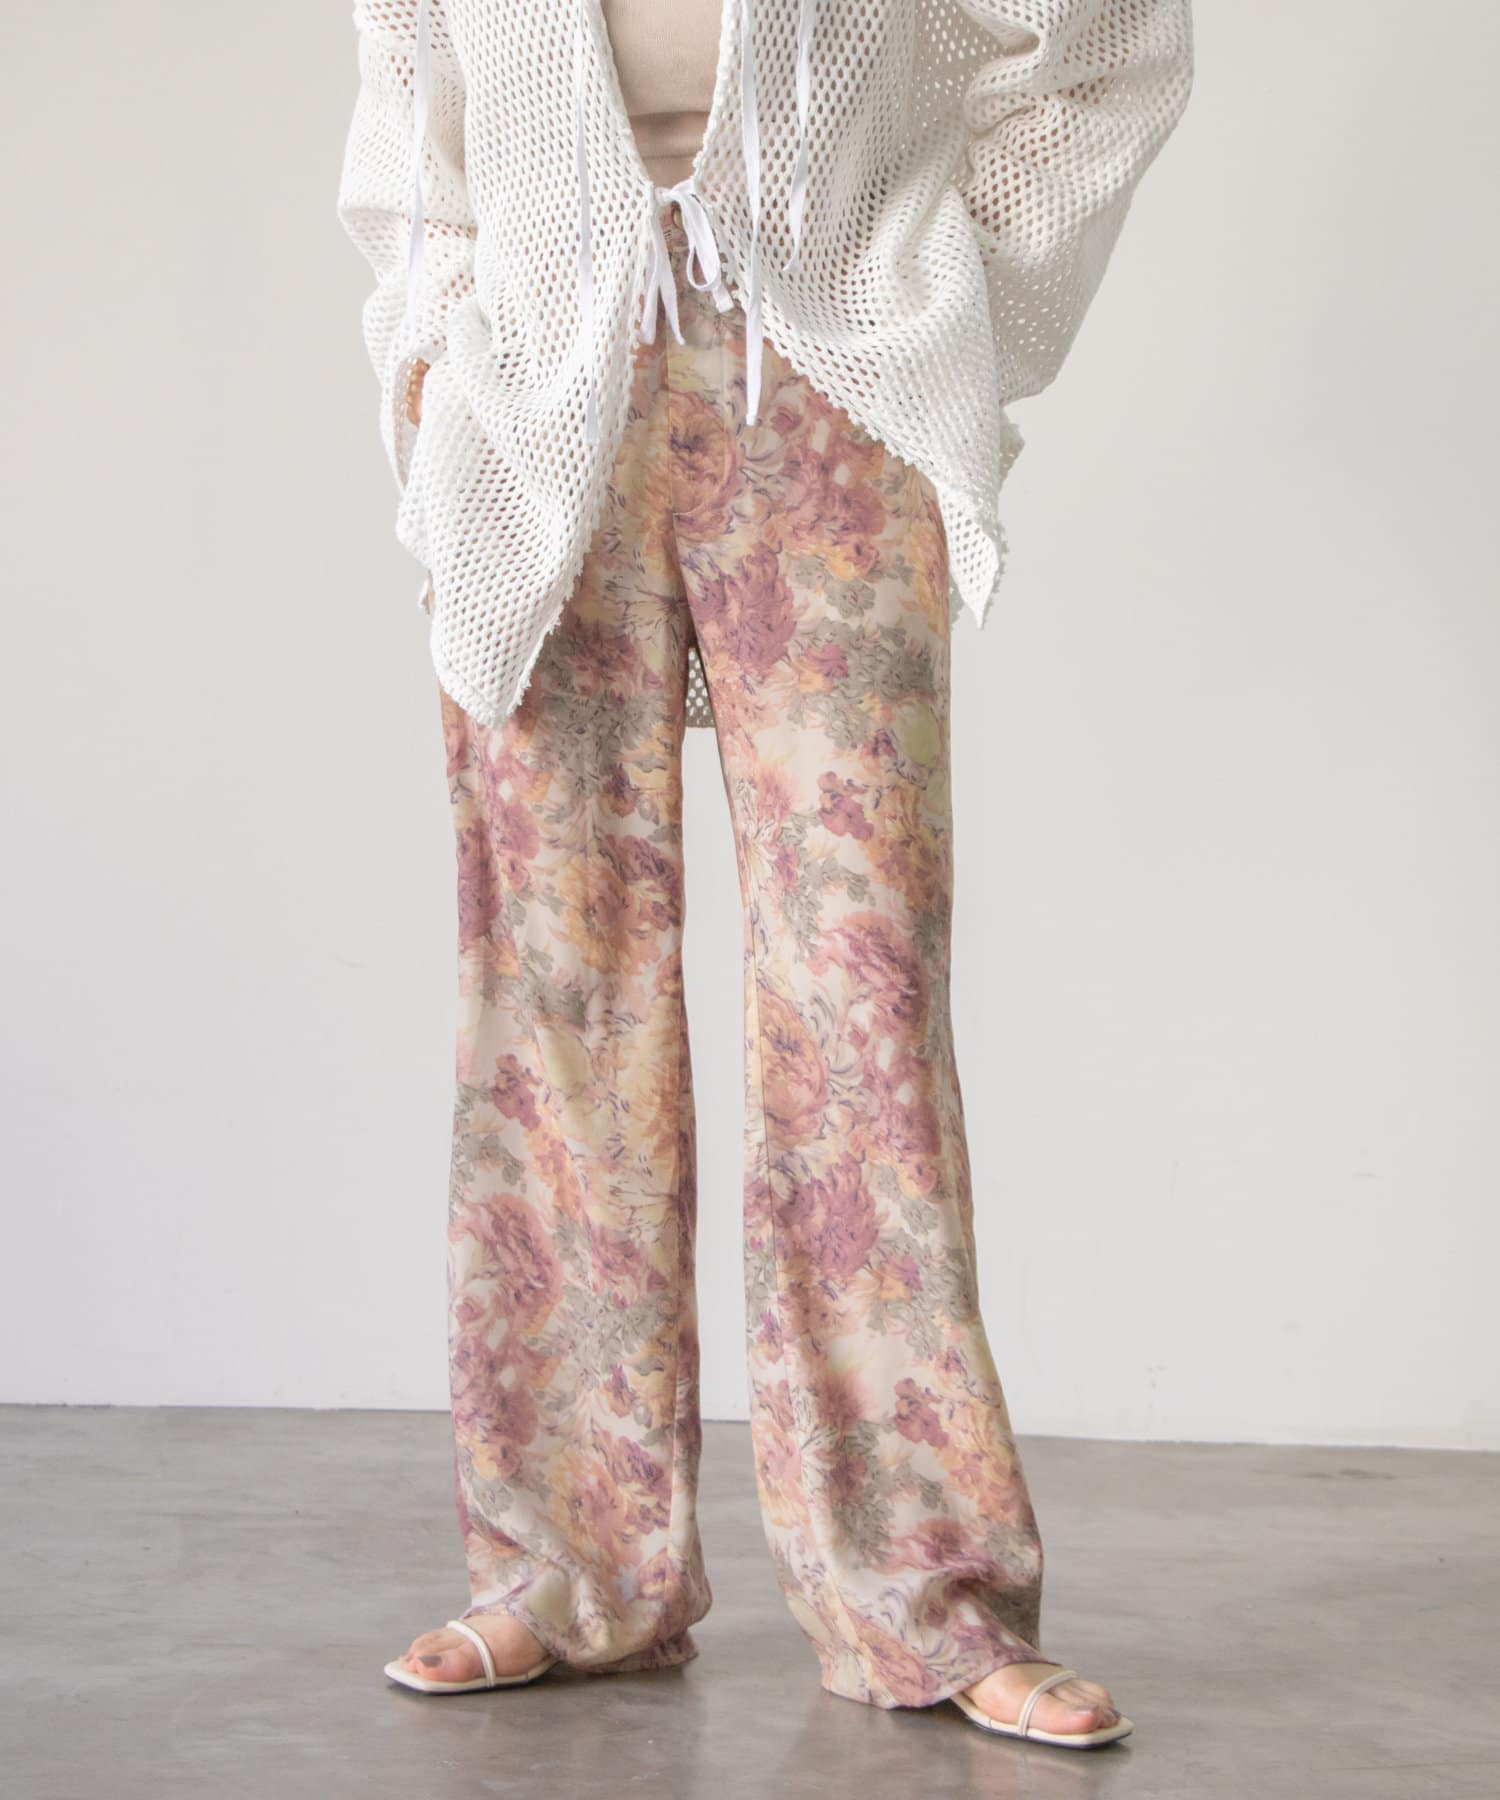 Kastane(カスタネ) SET UP Flower Print Shear Pants